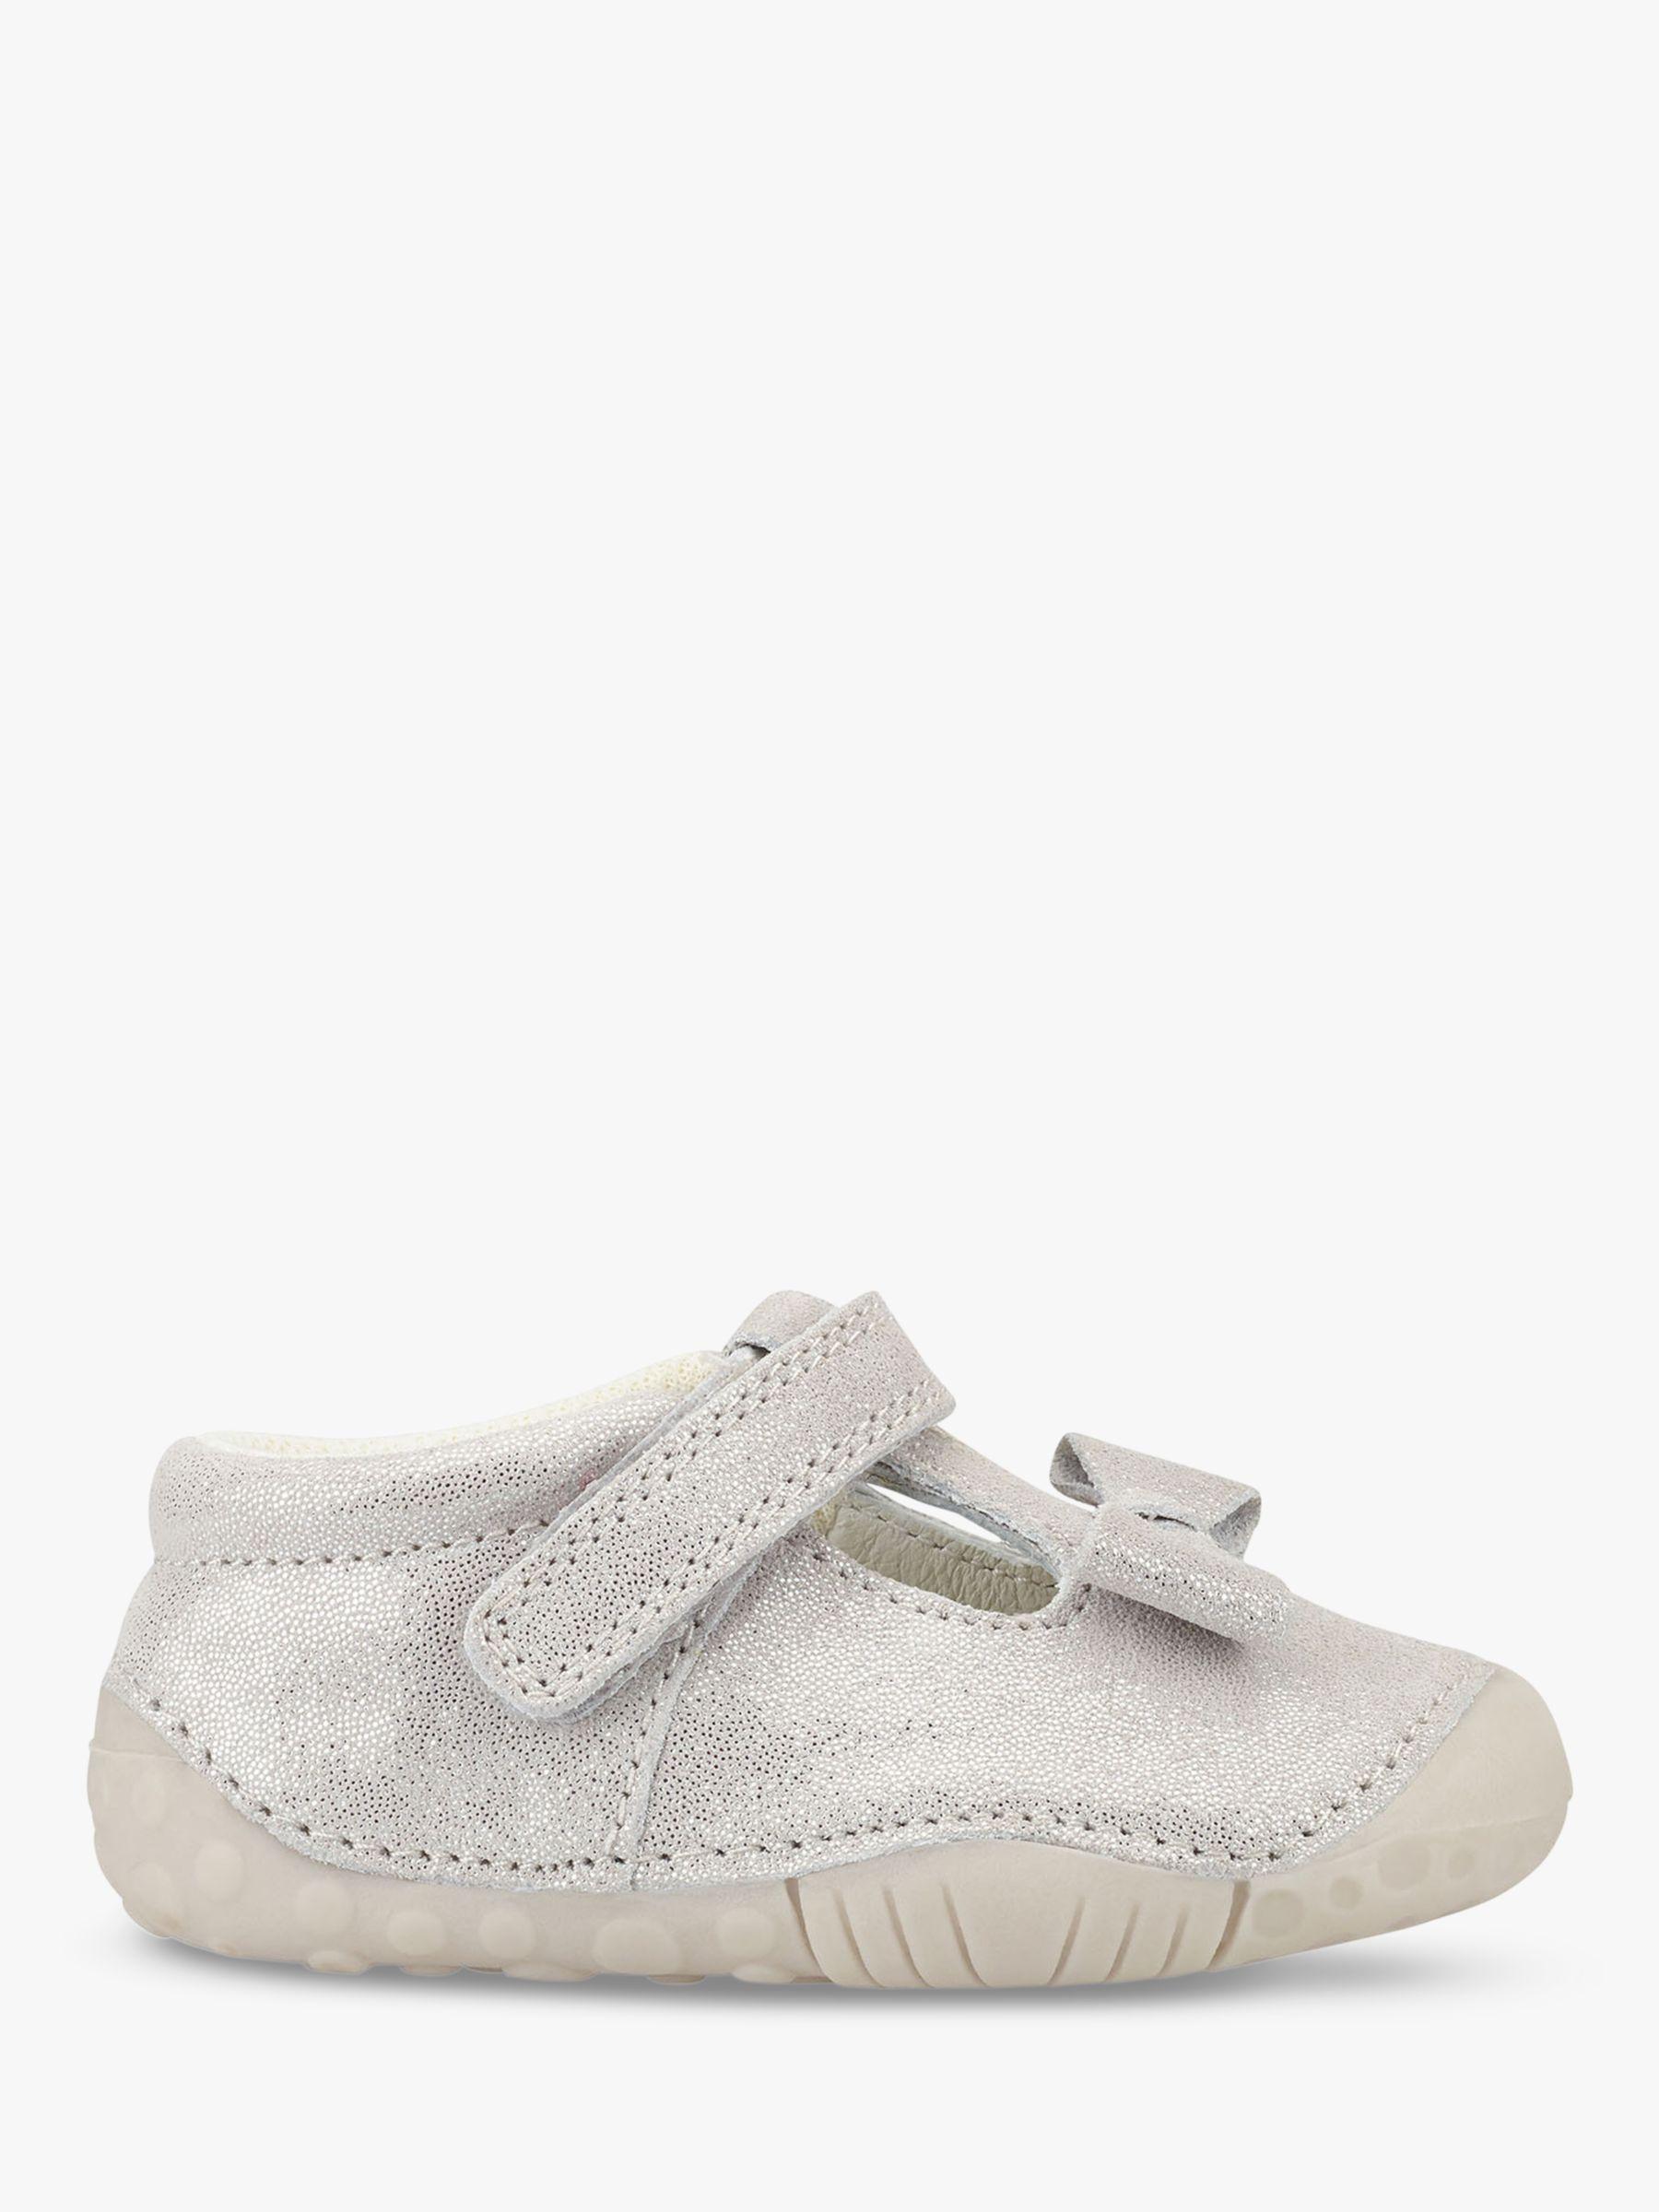 Start-Rite Start-rite Children's Wiggle T-Bar Pre-Walker Shoes, Pale Grey Glitter